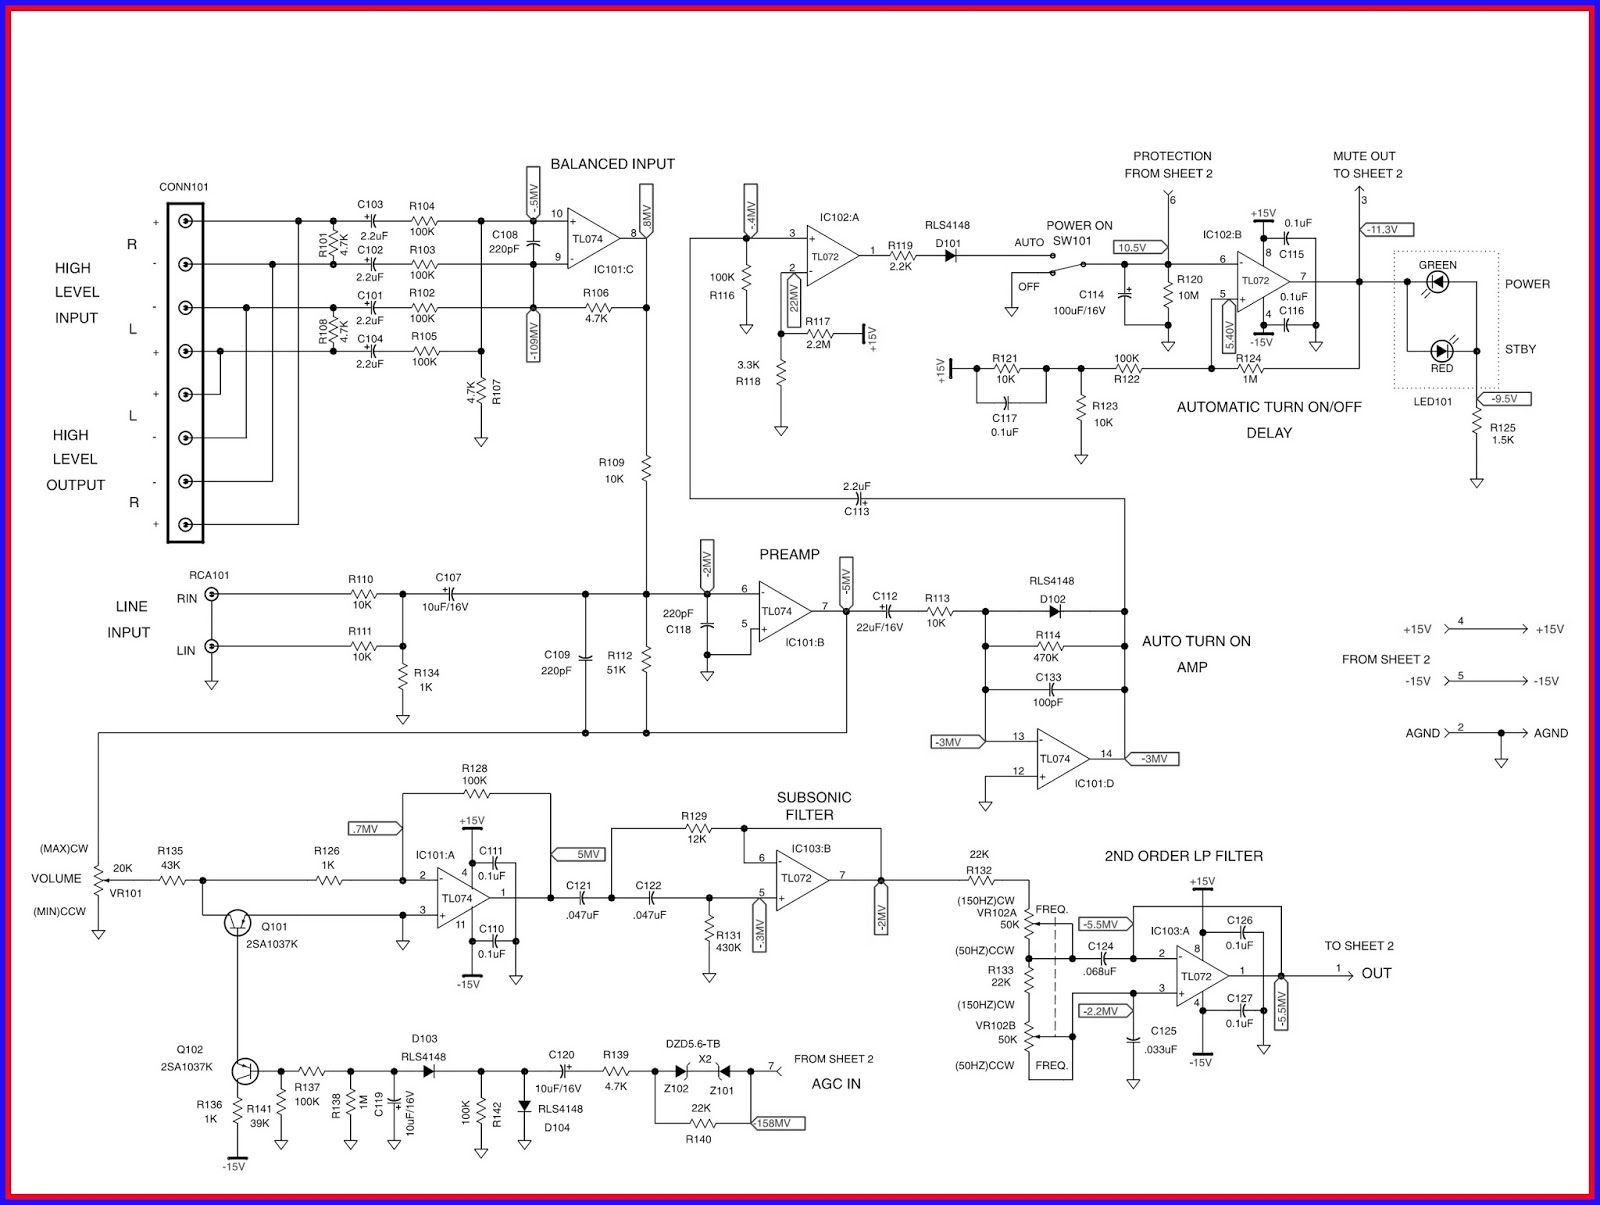 Mk Intermediate Switch Wiring Diagram 1976 Porsche 911 Bu 120 Subwoofer Circuit Radio